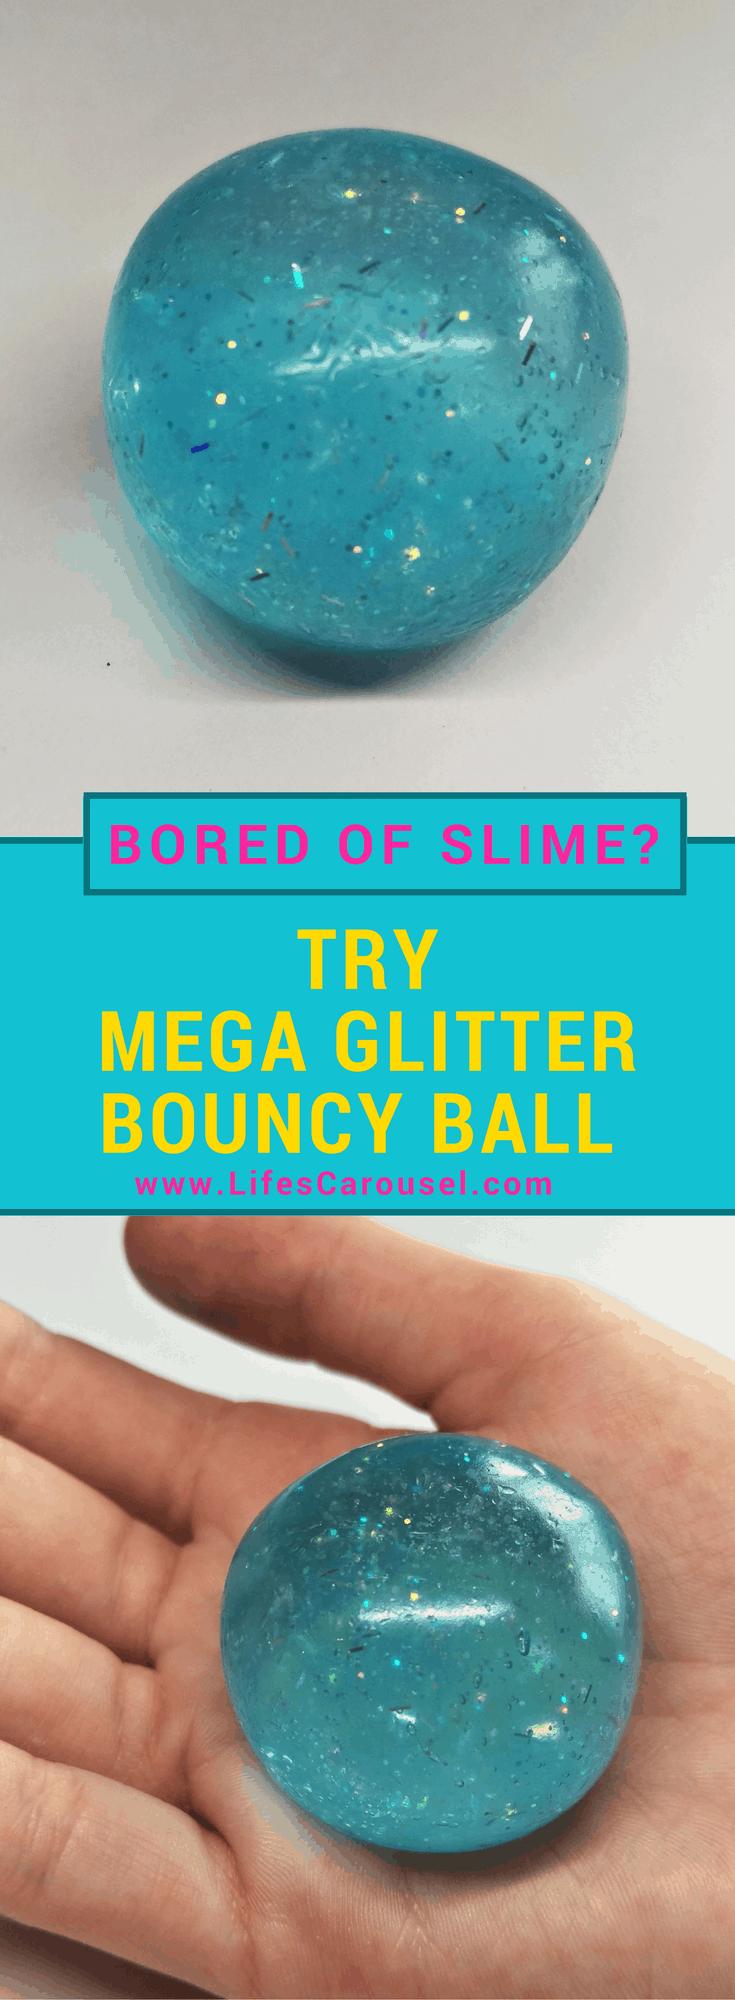 Photo of DIY Bouncy Balls – Easy Tutorial to Make Super Bouncy Balls!